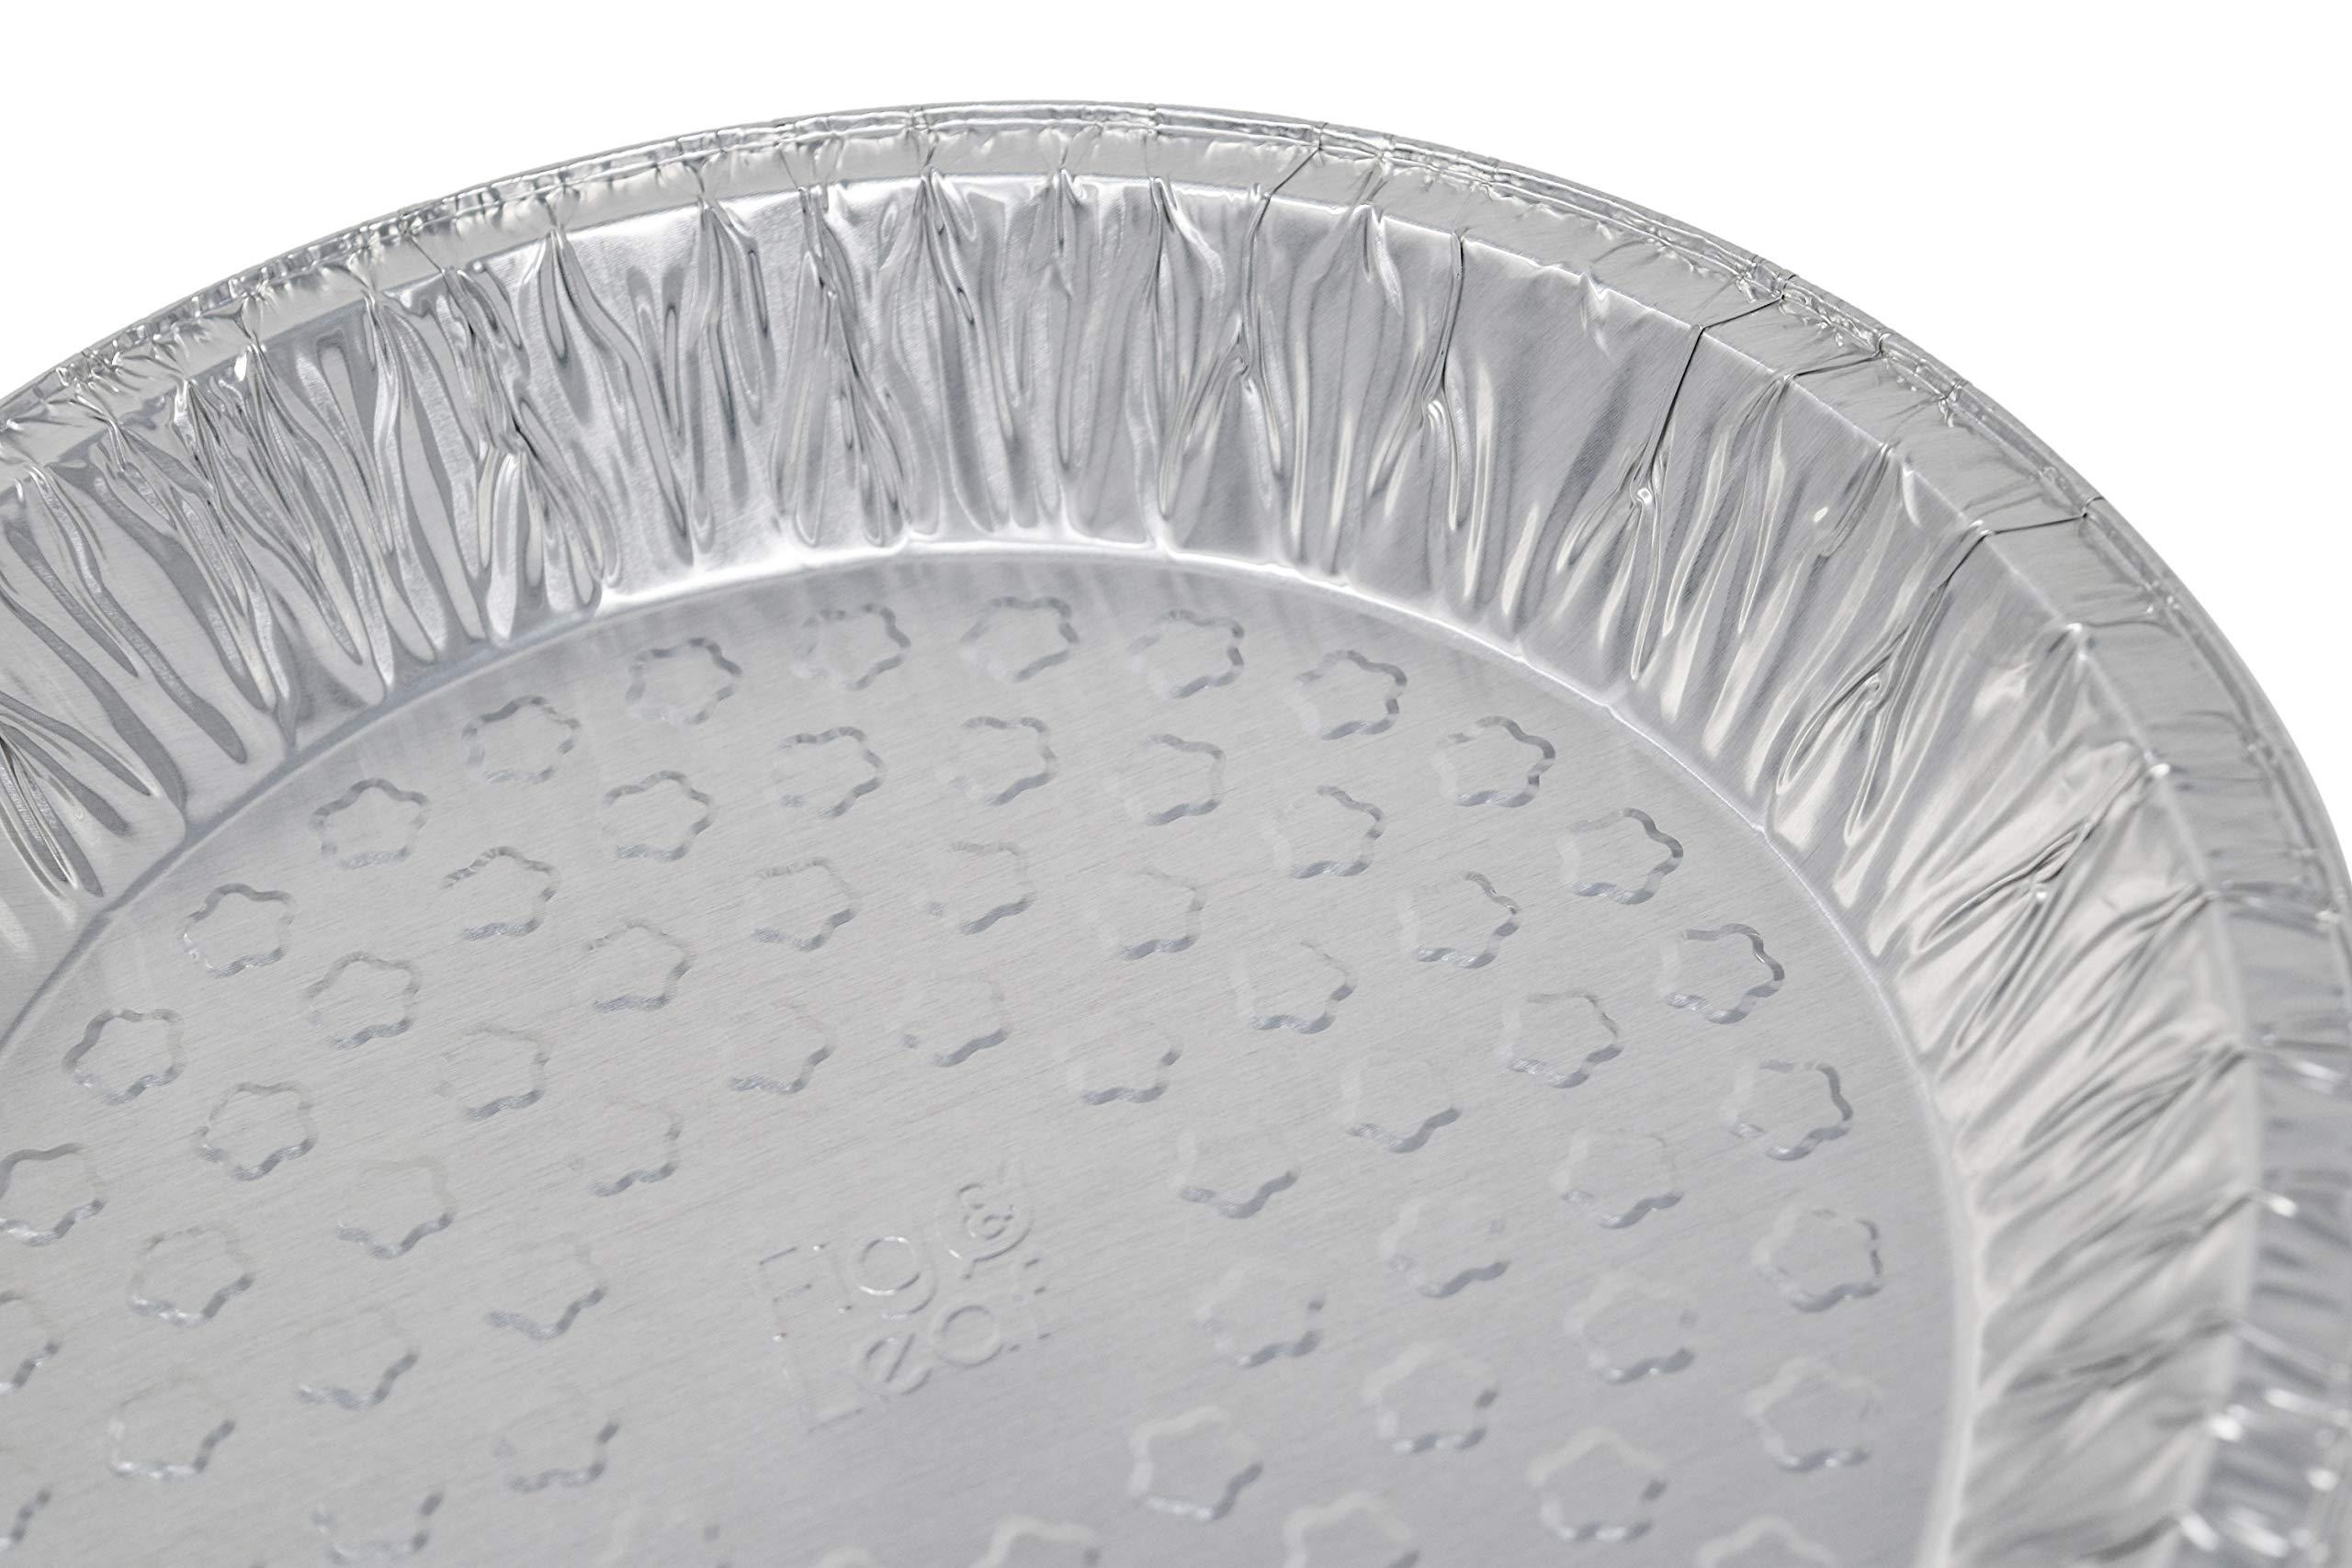 Fig & Leaf (120 Pack) Premium 9-Inch Pie Pans l 36 Gauge l Disposable Tart Pan Tin Plates Aluminum Foil for Baking Quiche by Fig & Leaf (Image #6)